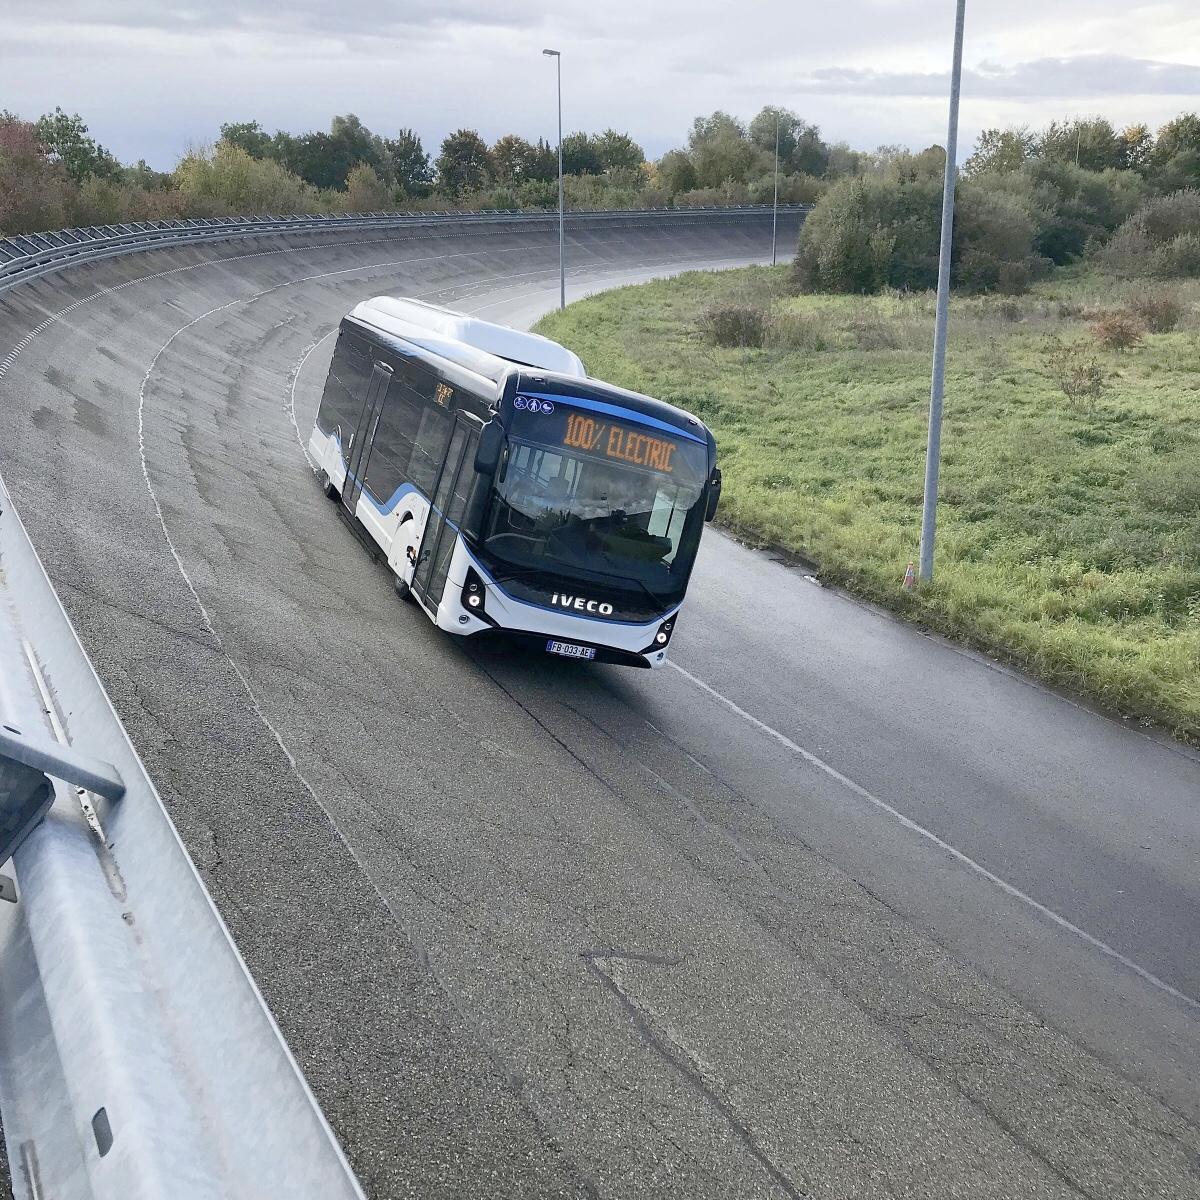 Testovanie - Elektrobus Iveco e-way